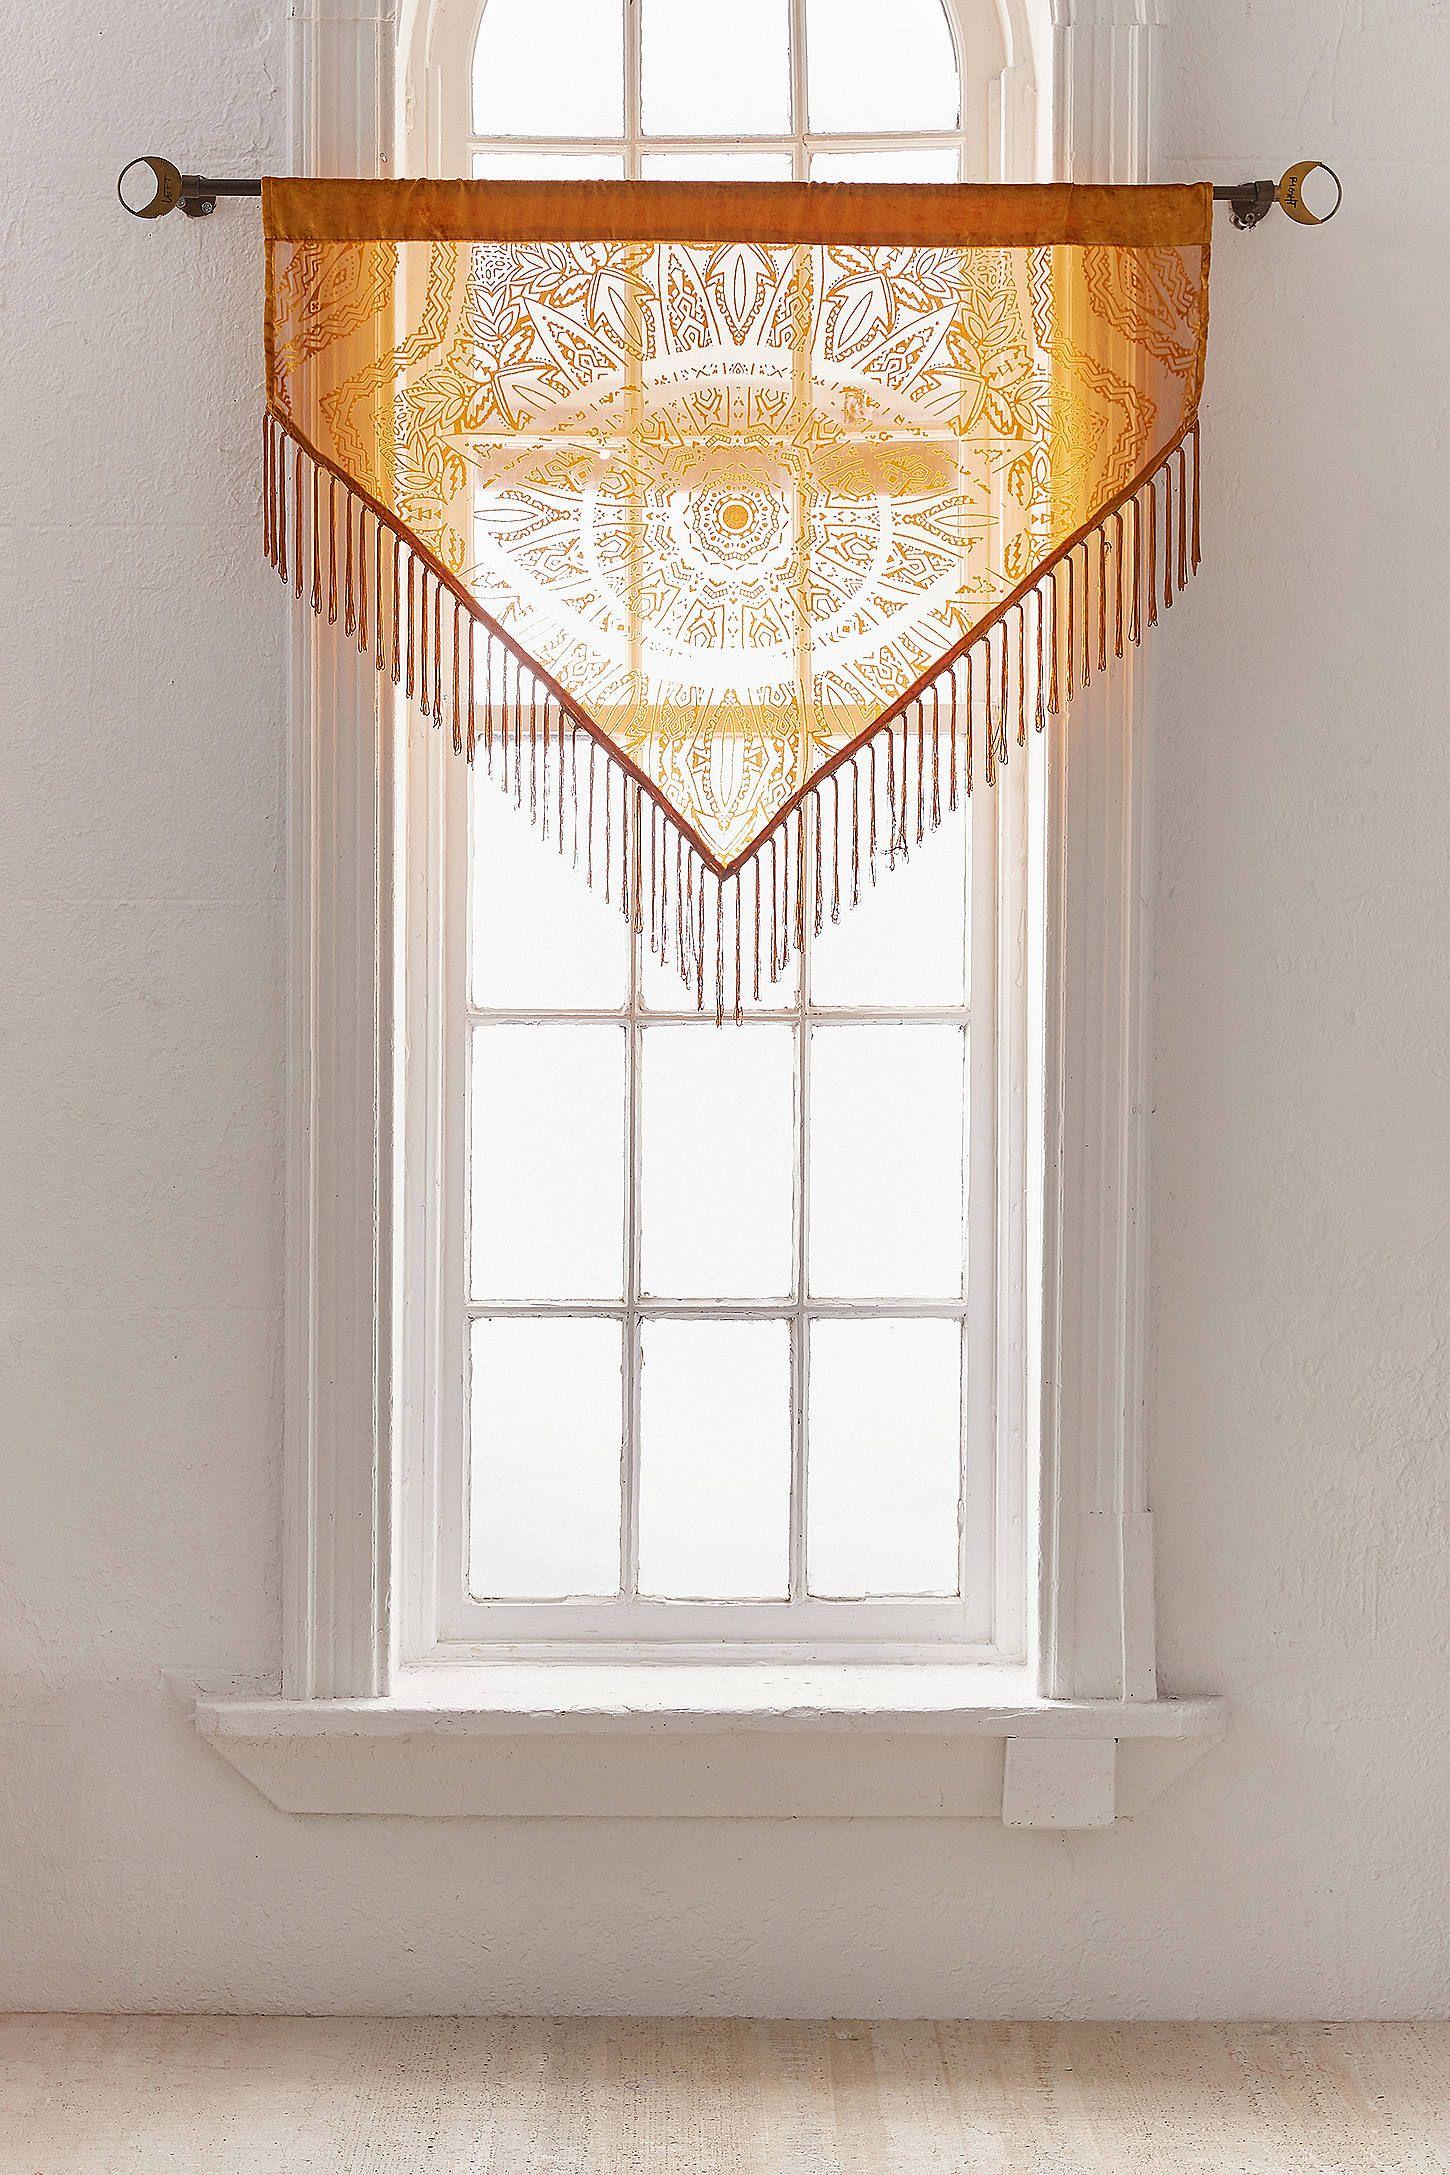 Fensterbehang aus Samt mit Burnout-Augendesign | Valance, Window and ...